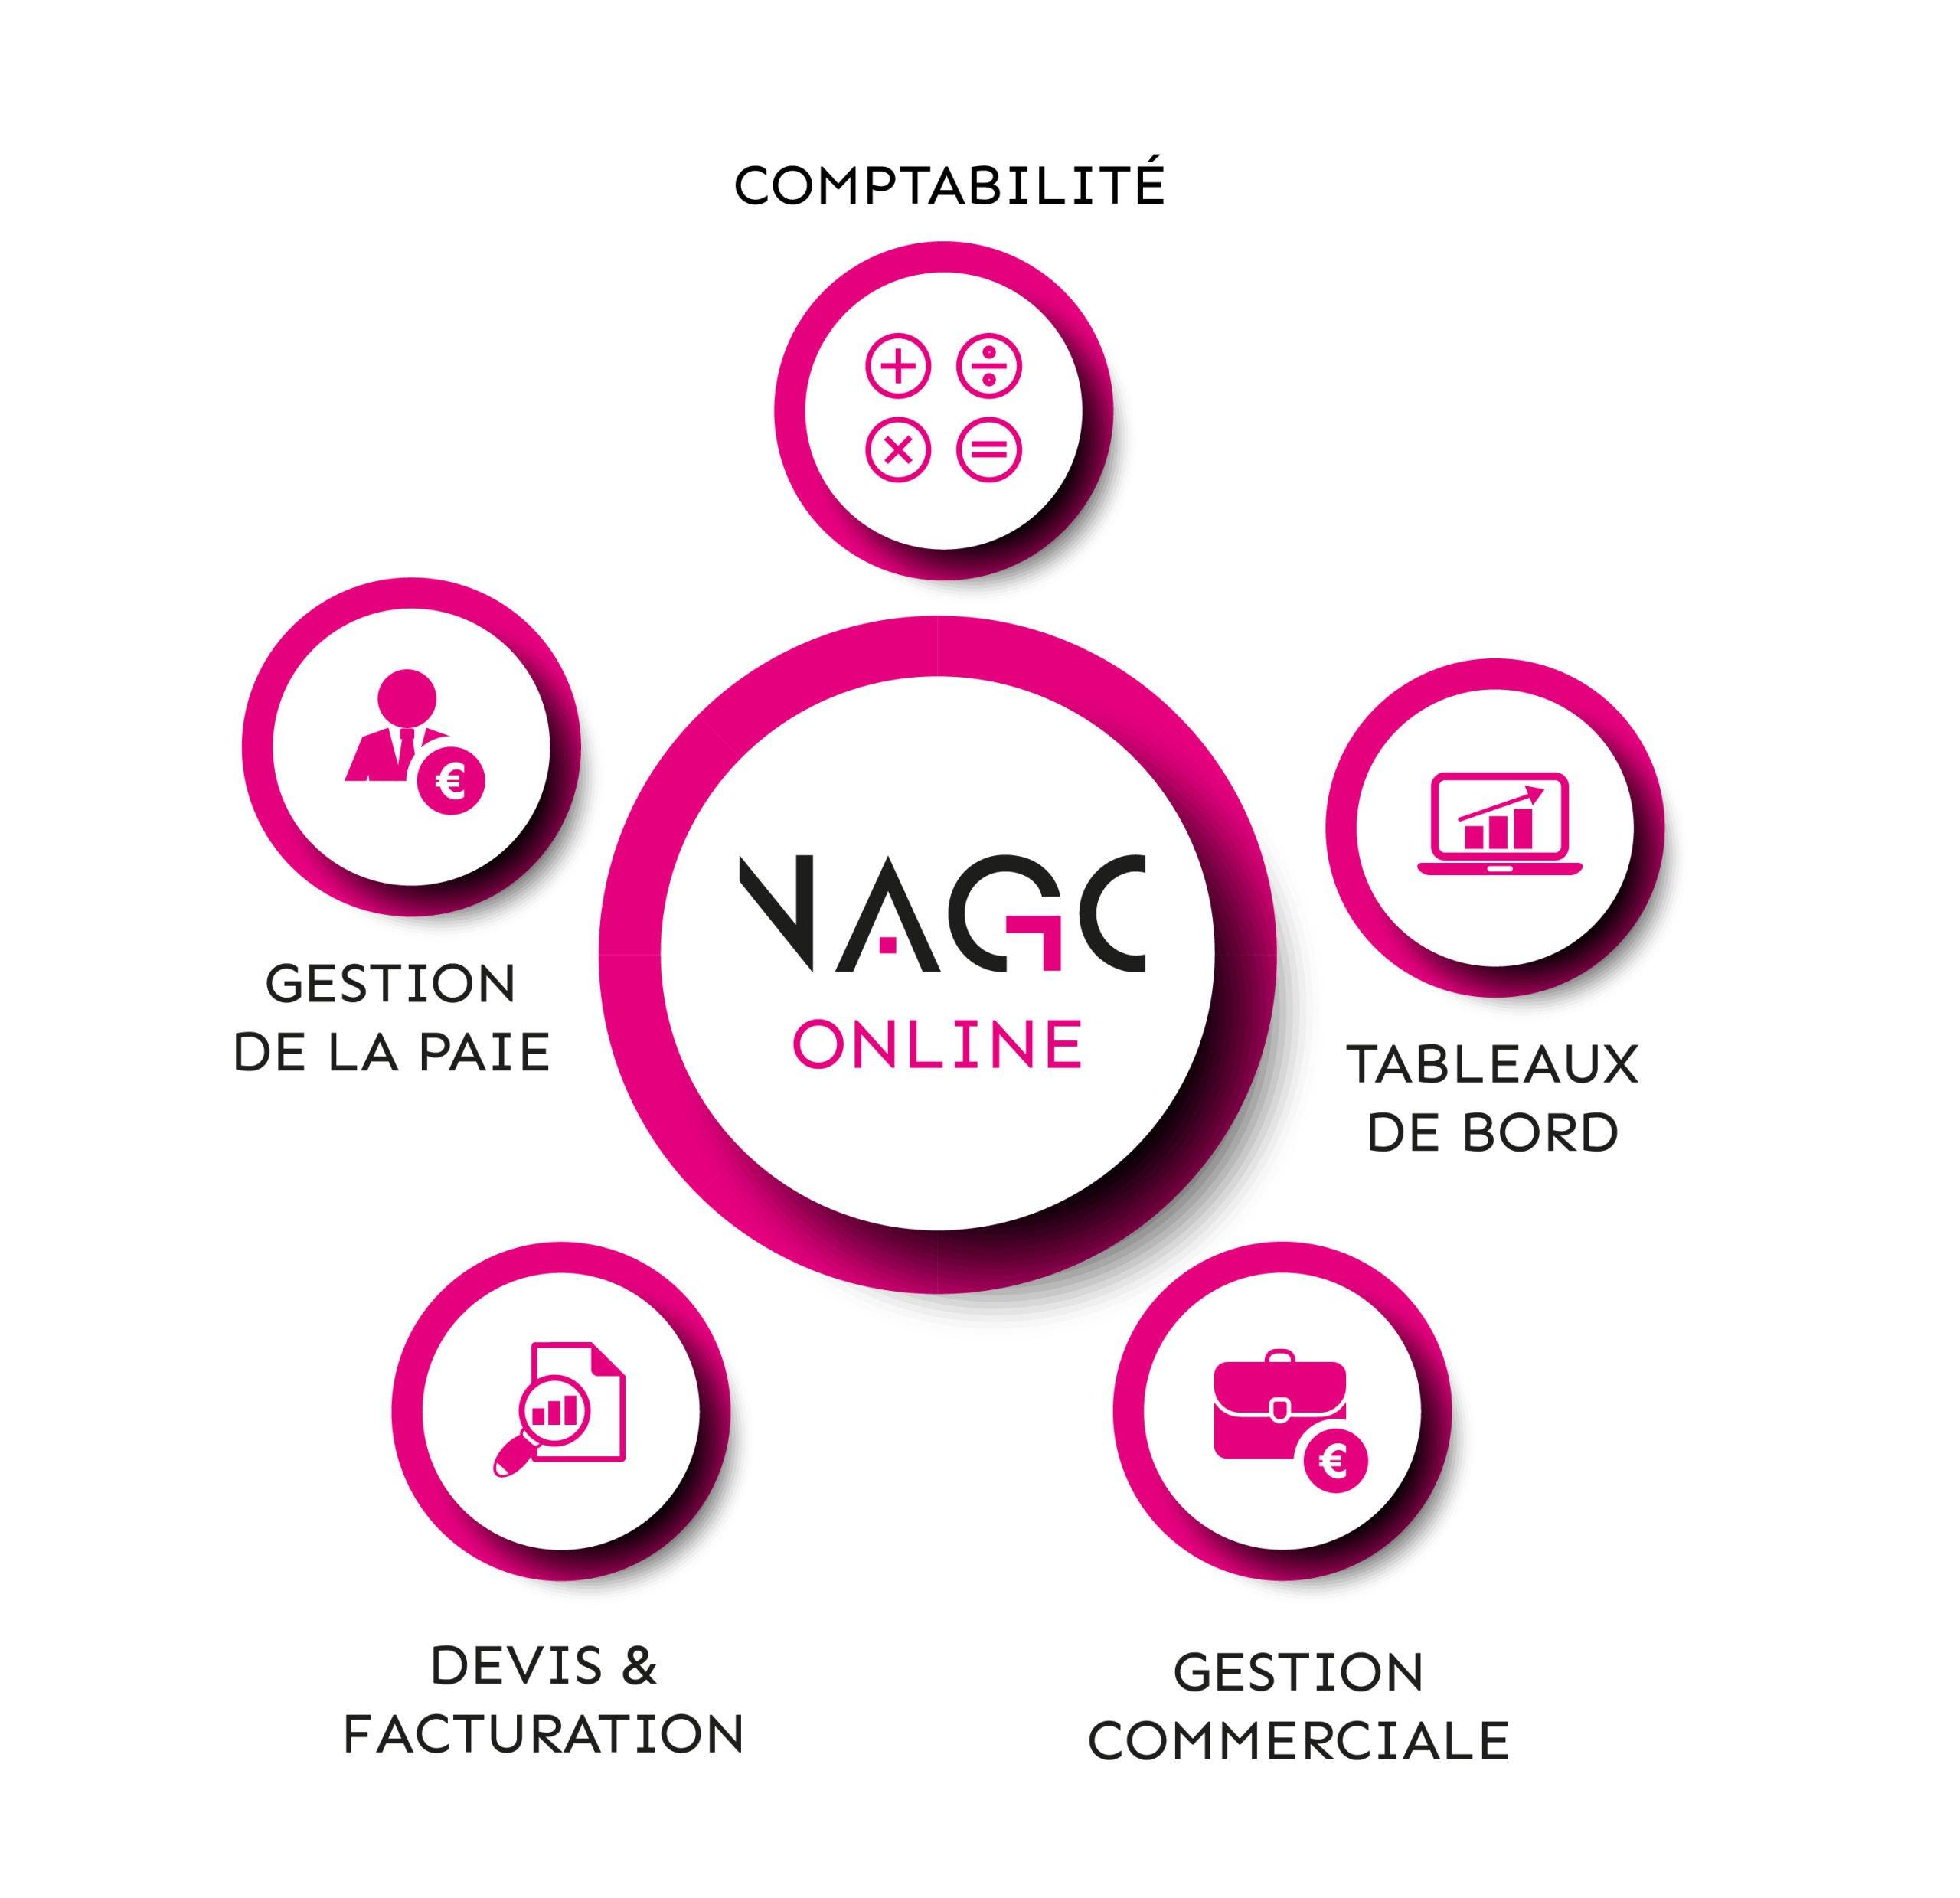 schema NAGC online